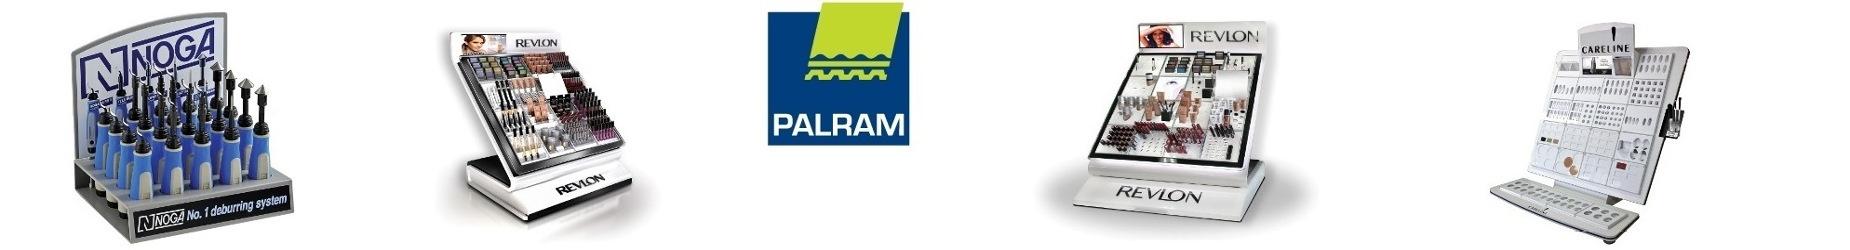 Plaster distributore Palram